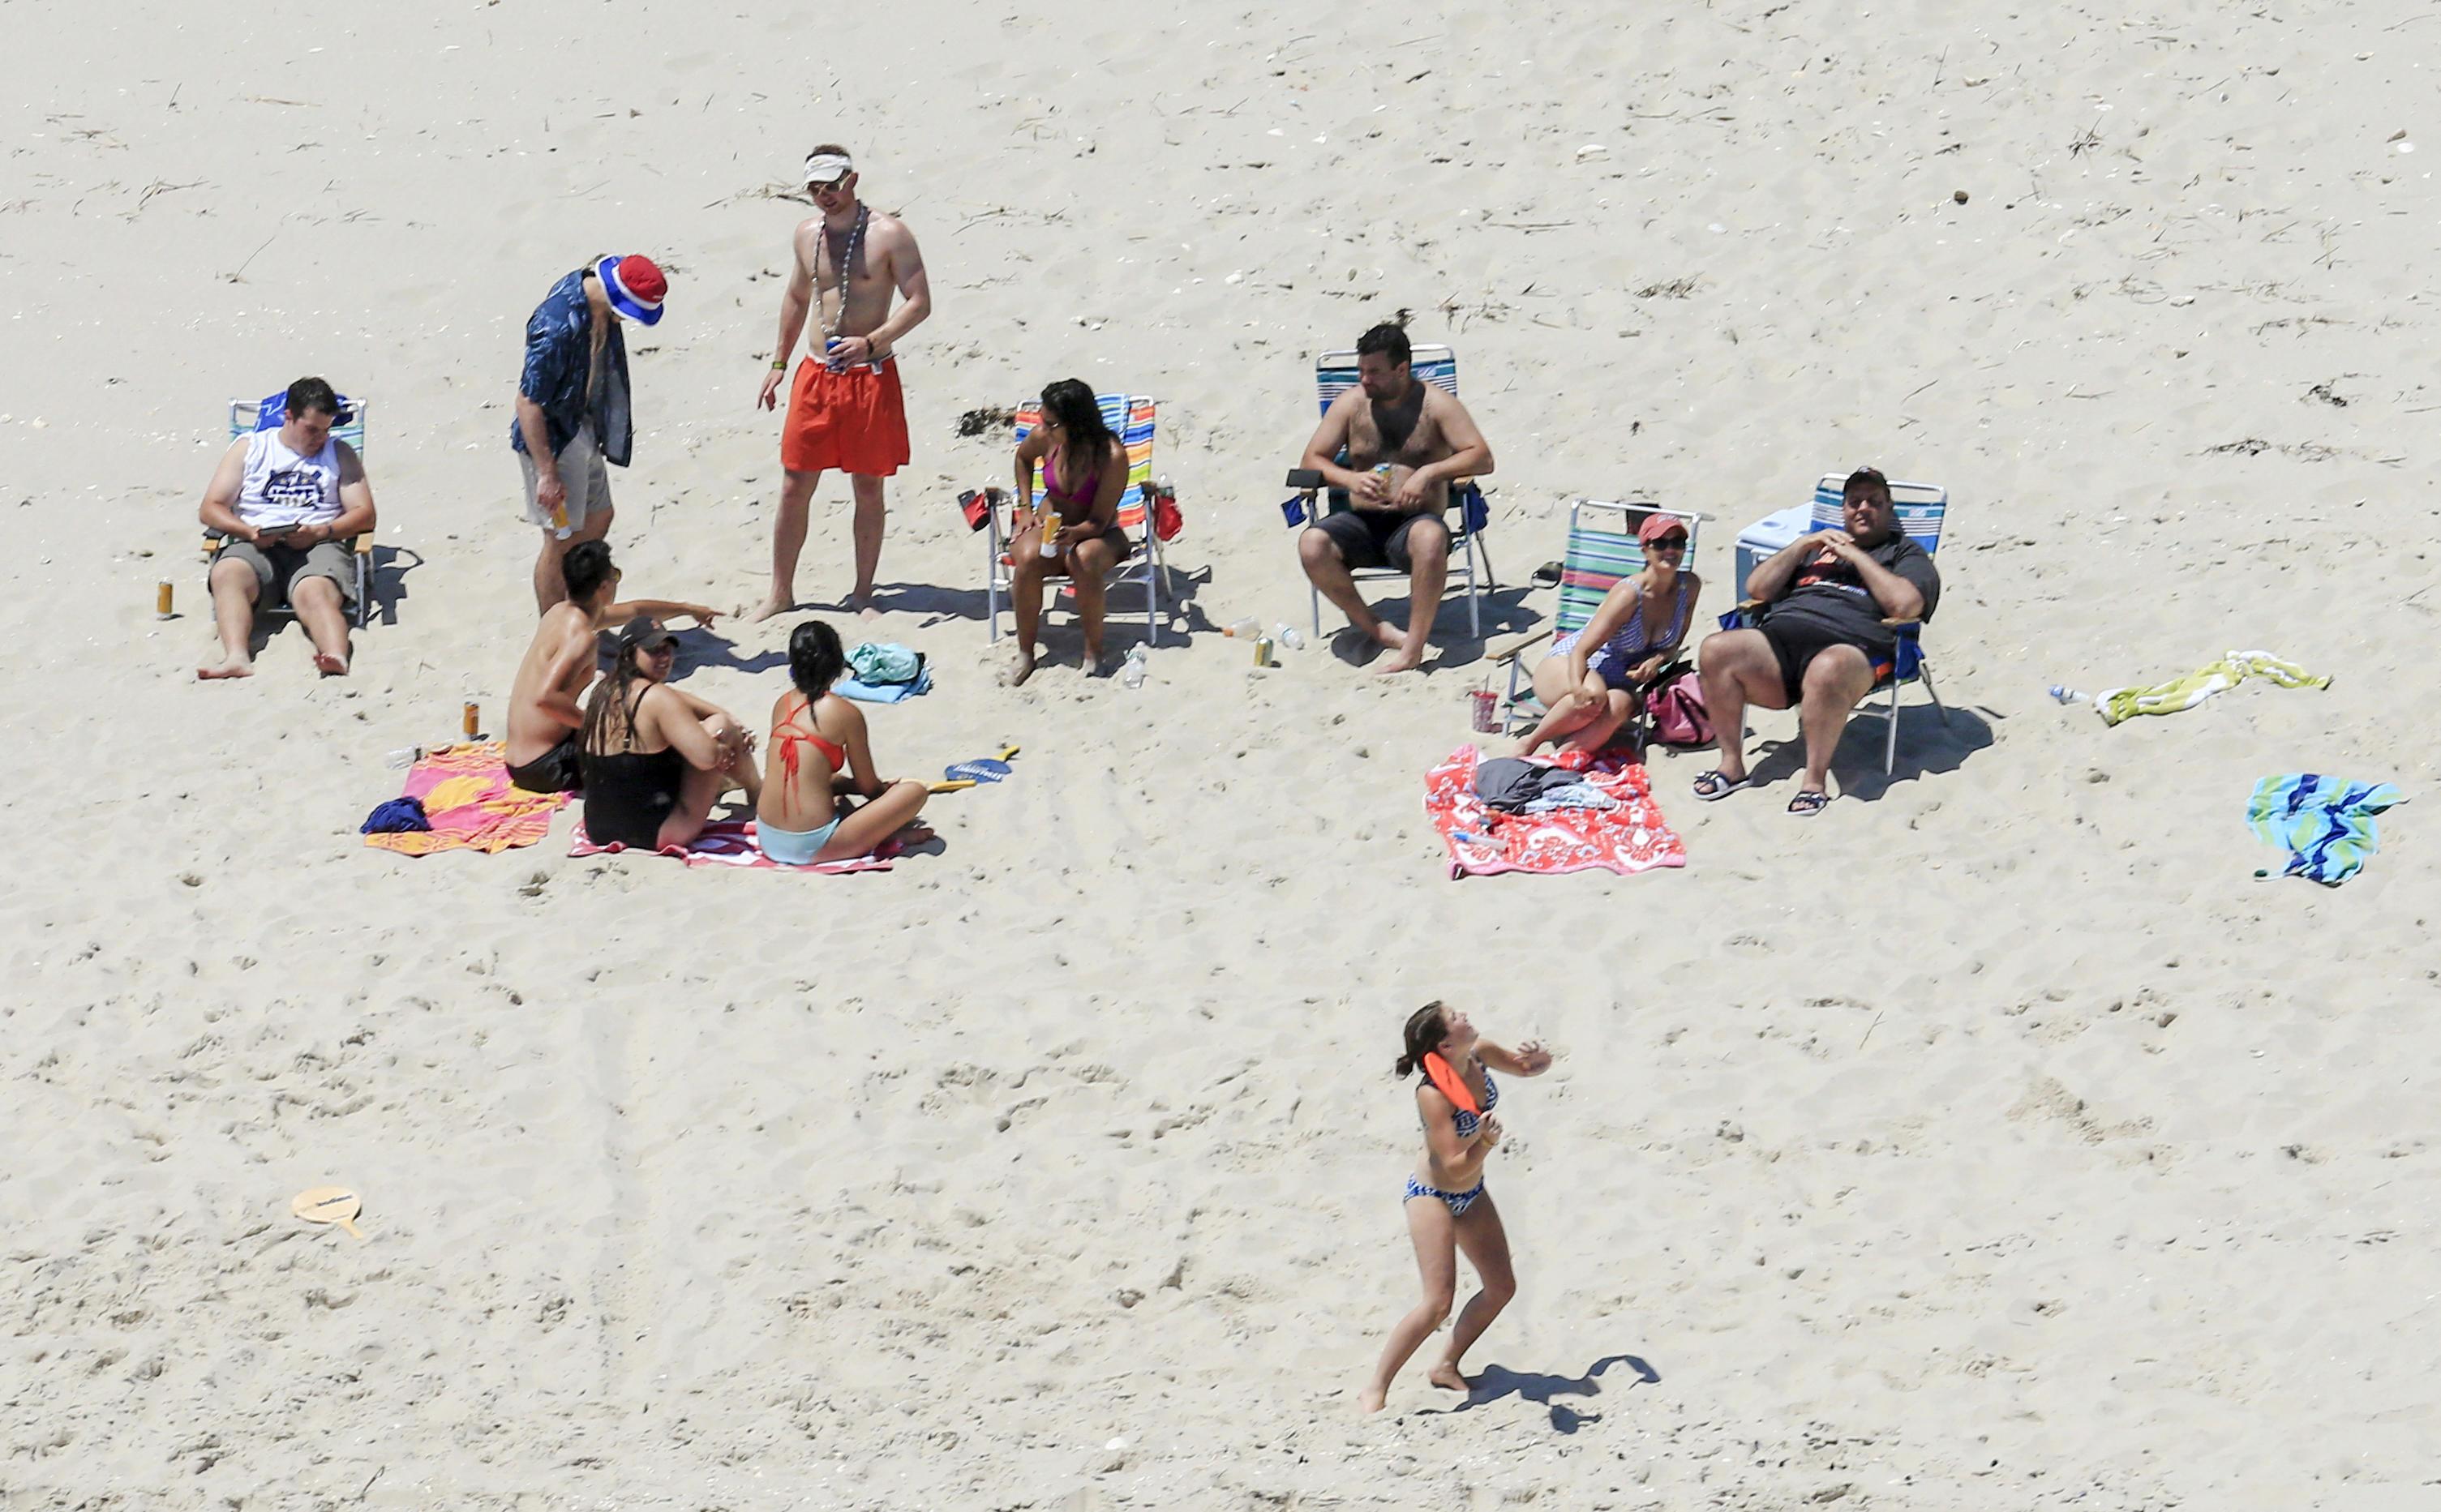 37b5d4efce4 Chris Christie faces criticism over budget crisis as photo shows him at  closed beach